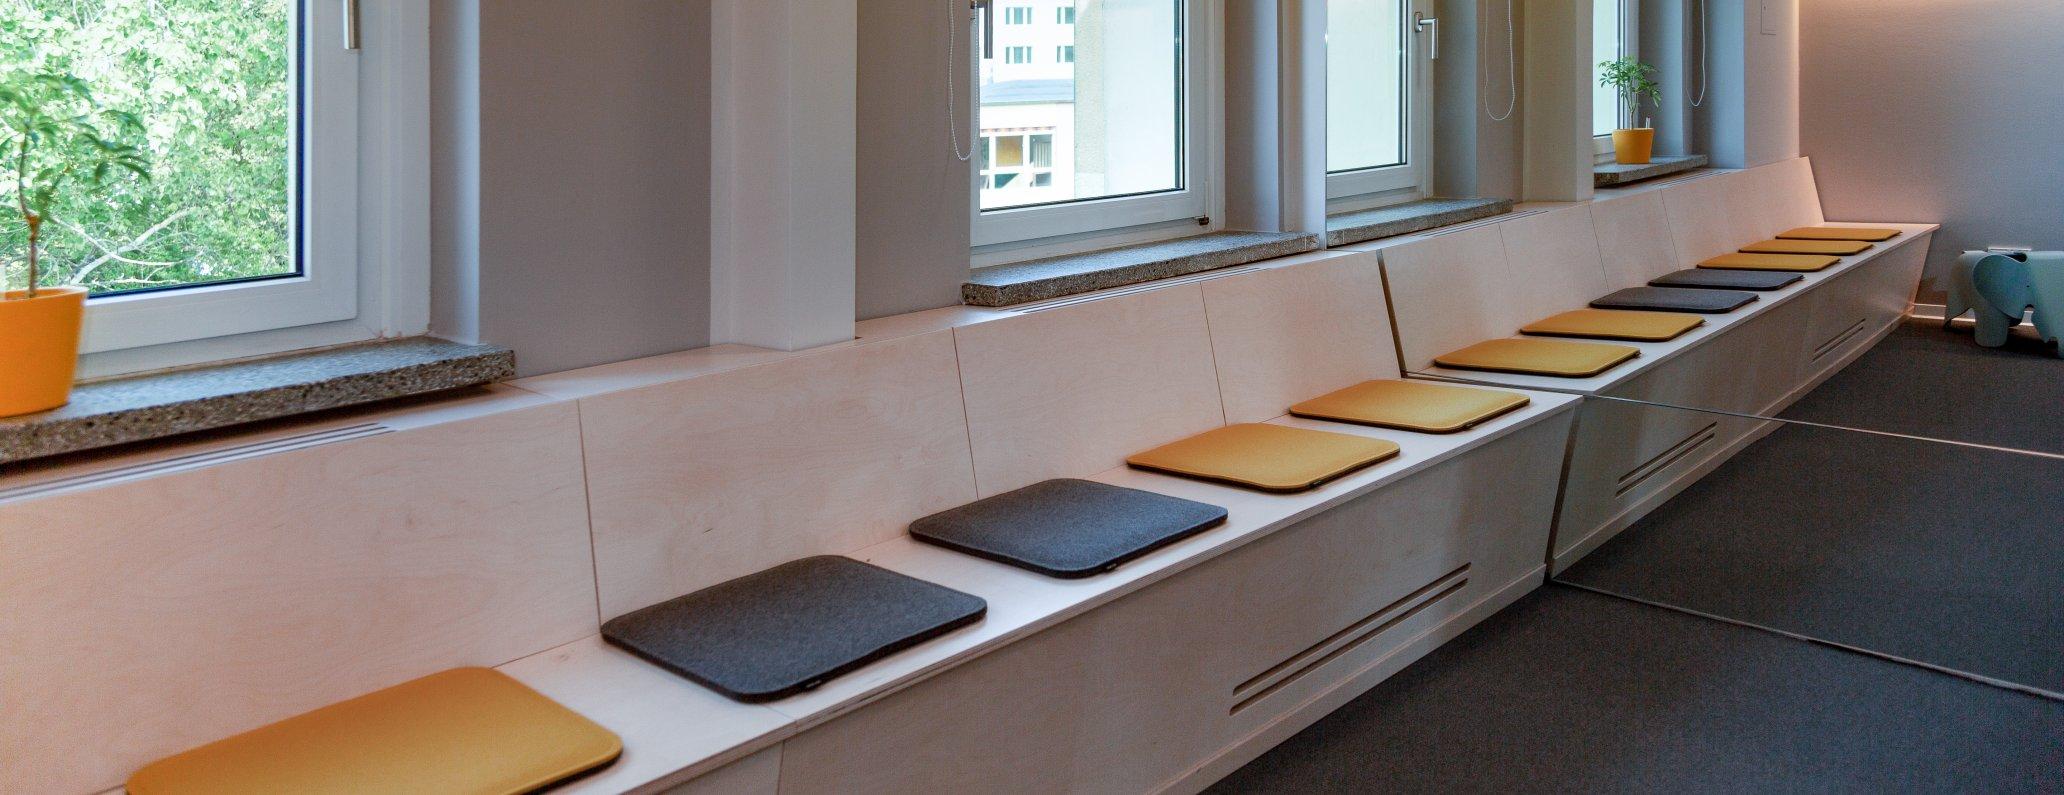 Waiting room medical practice, Chemnitz